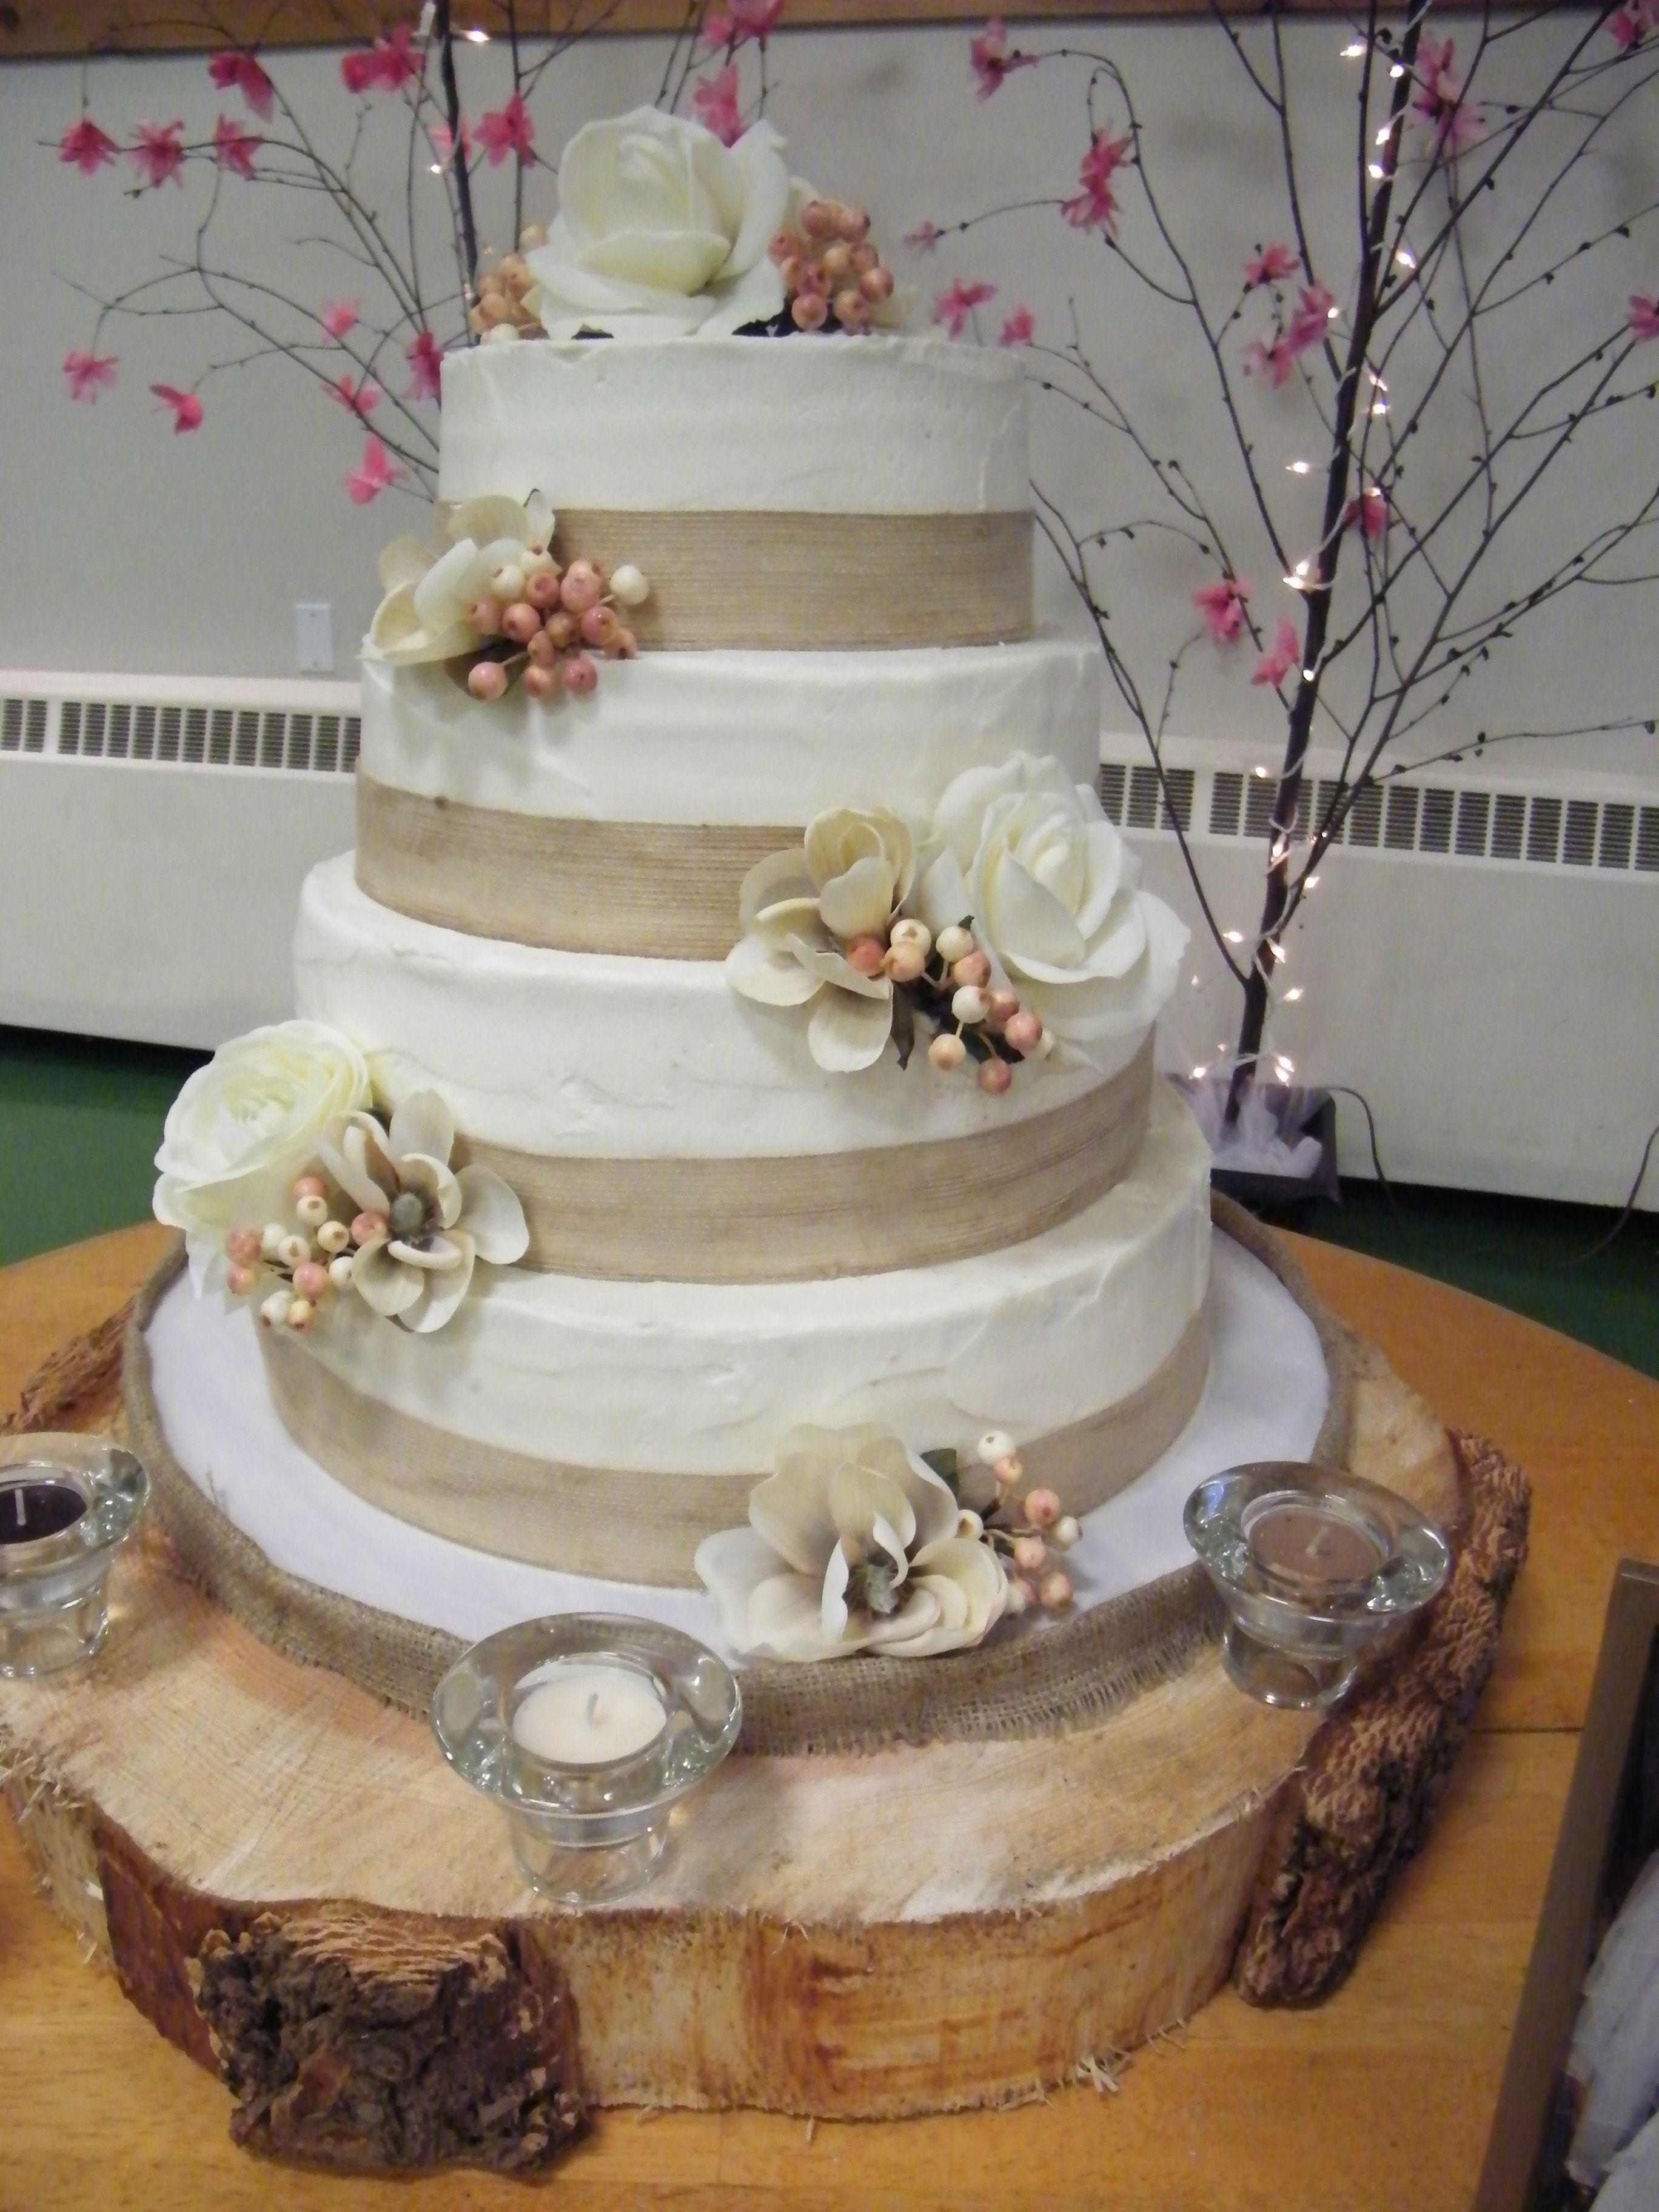 Rustic Themed Wedding Cake Banana Cake With Caramel Creamcheese